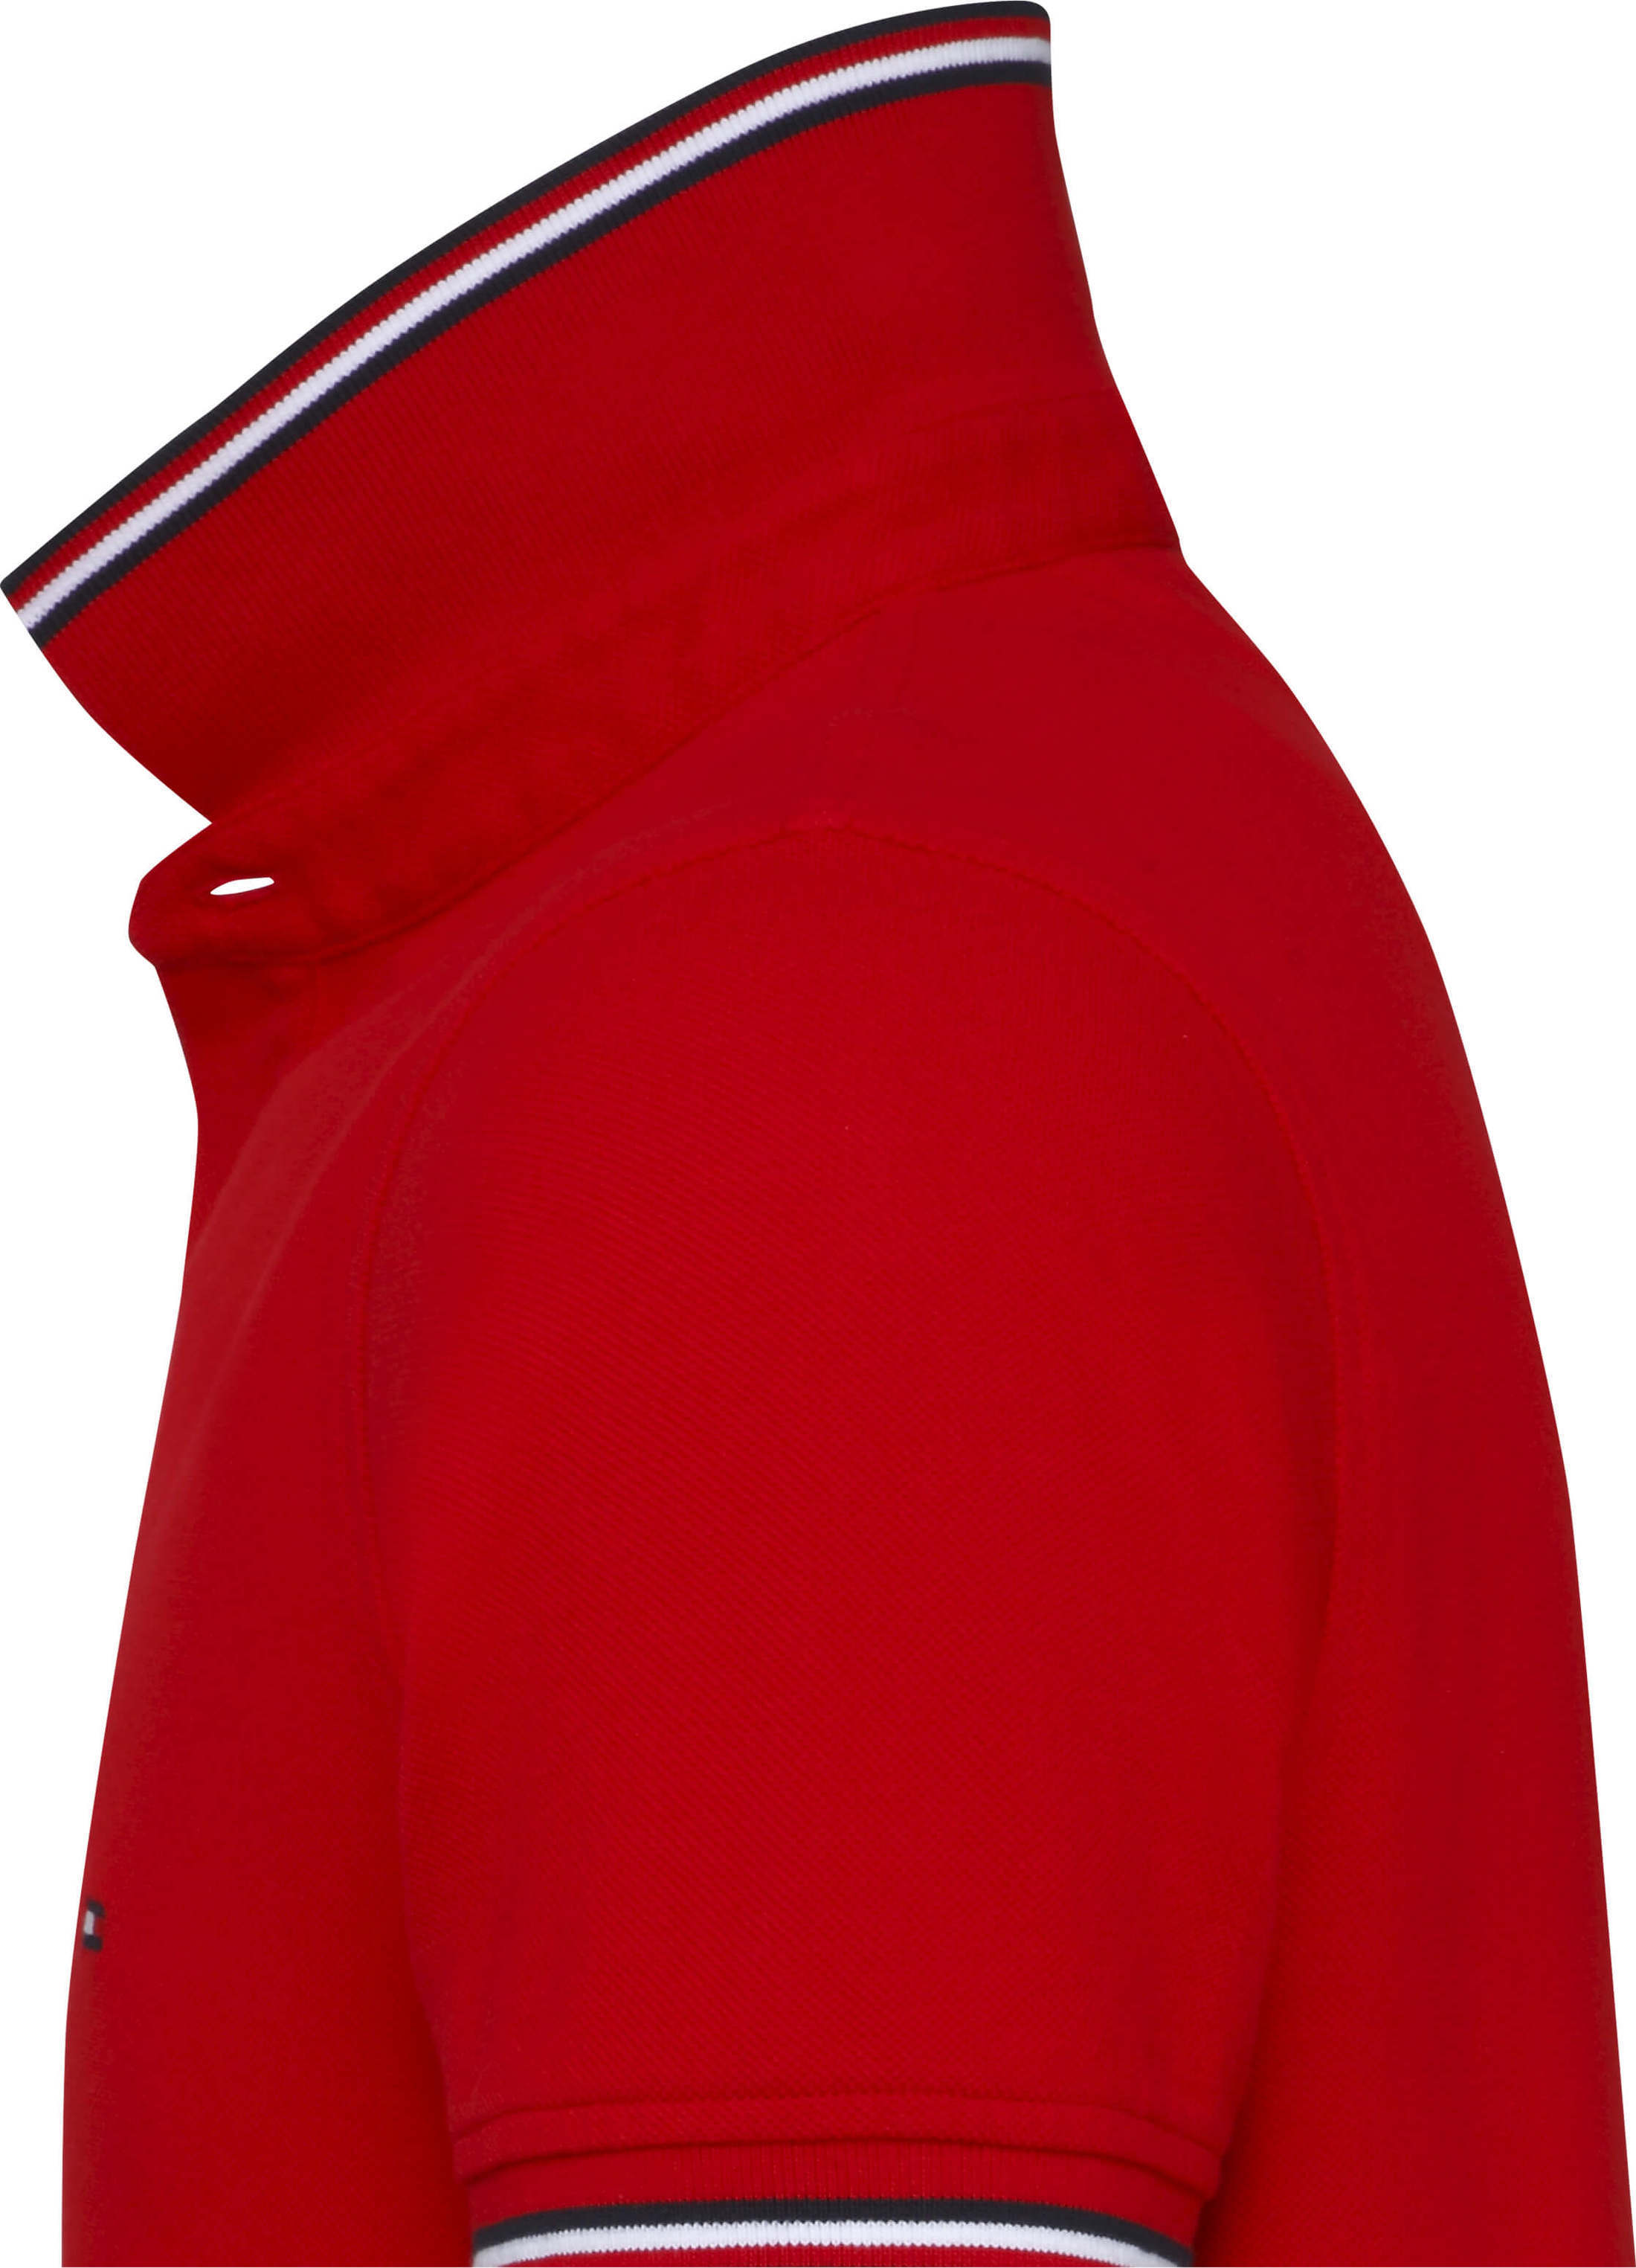 Tommy Hilfiger Stripes Poloshirt Red foto 1